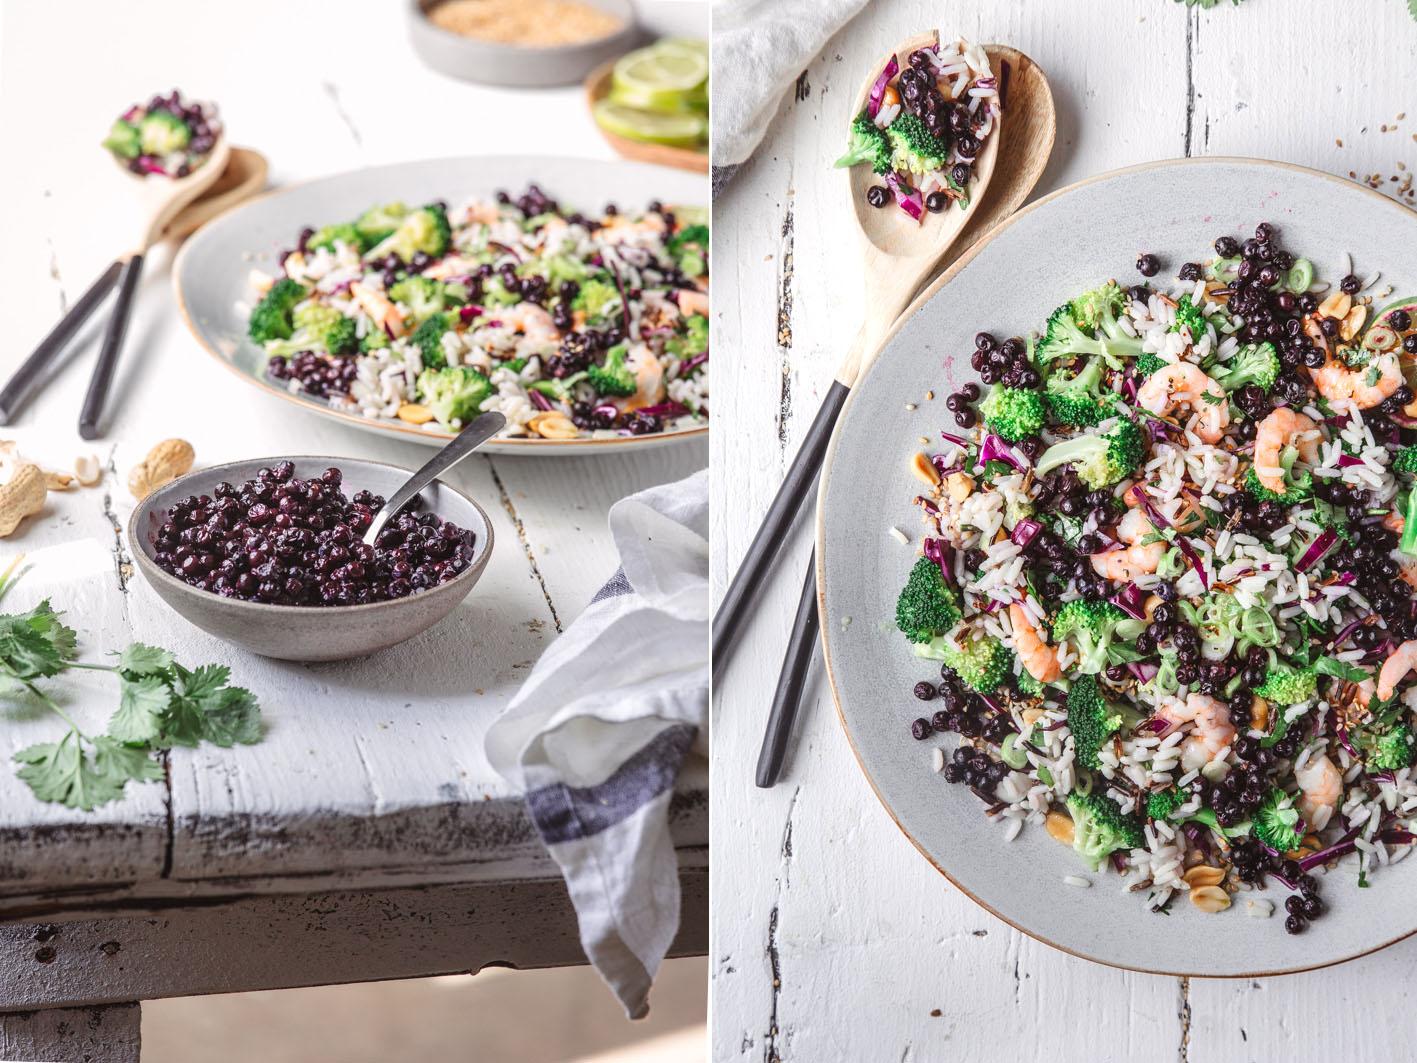 Blaubeer-Reissalat